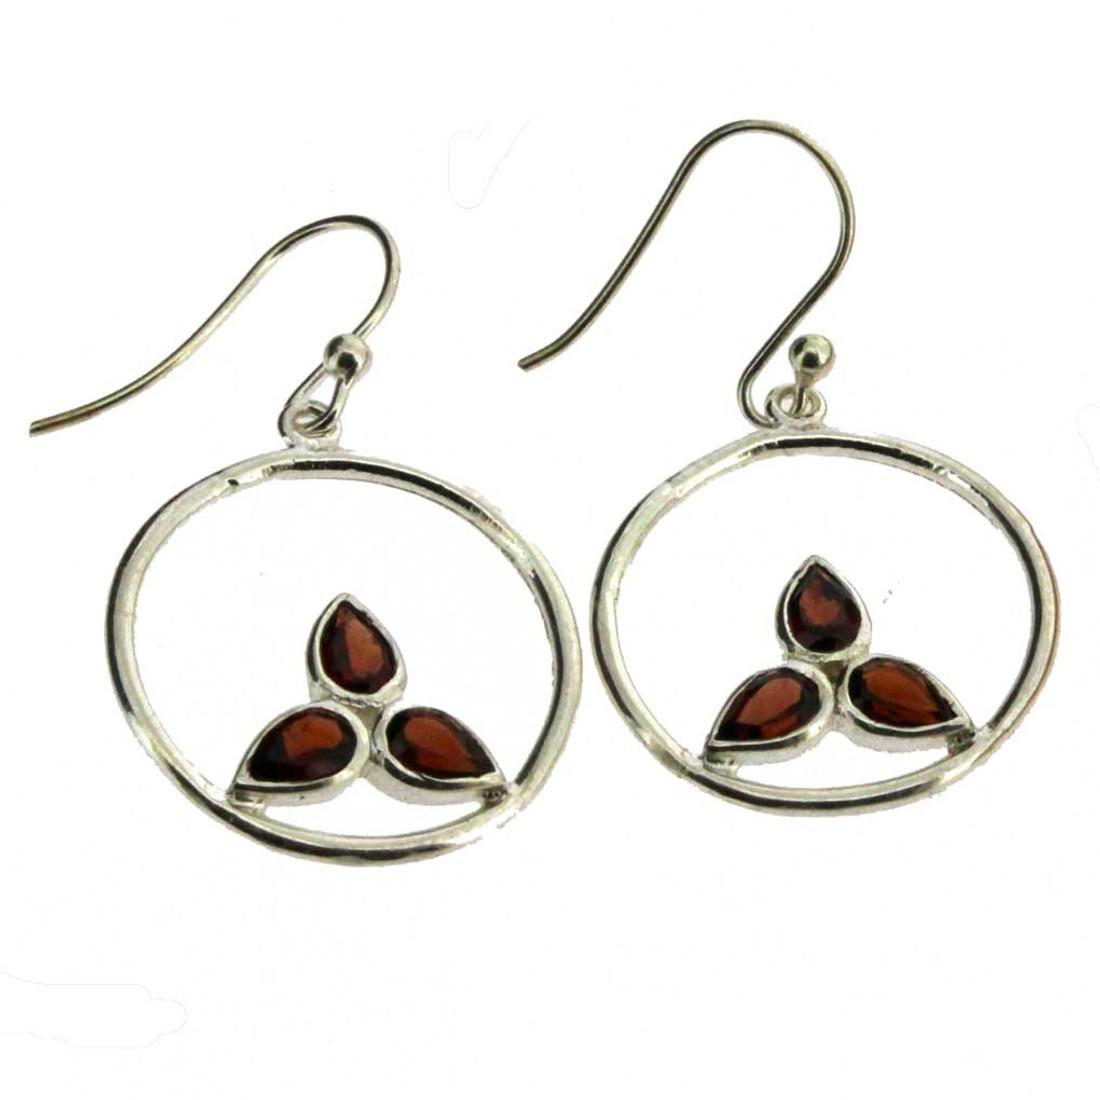 Faceted Red Garnet Earrings Leaf Shape Design Circle Dangle Sterling Silver